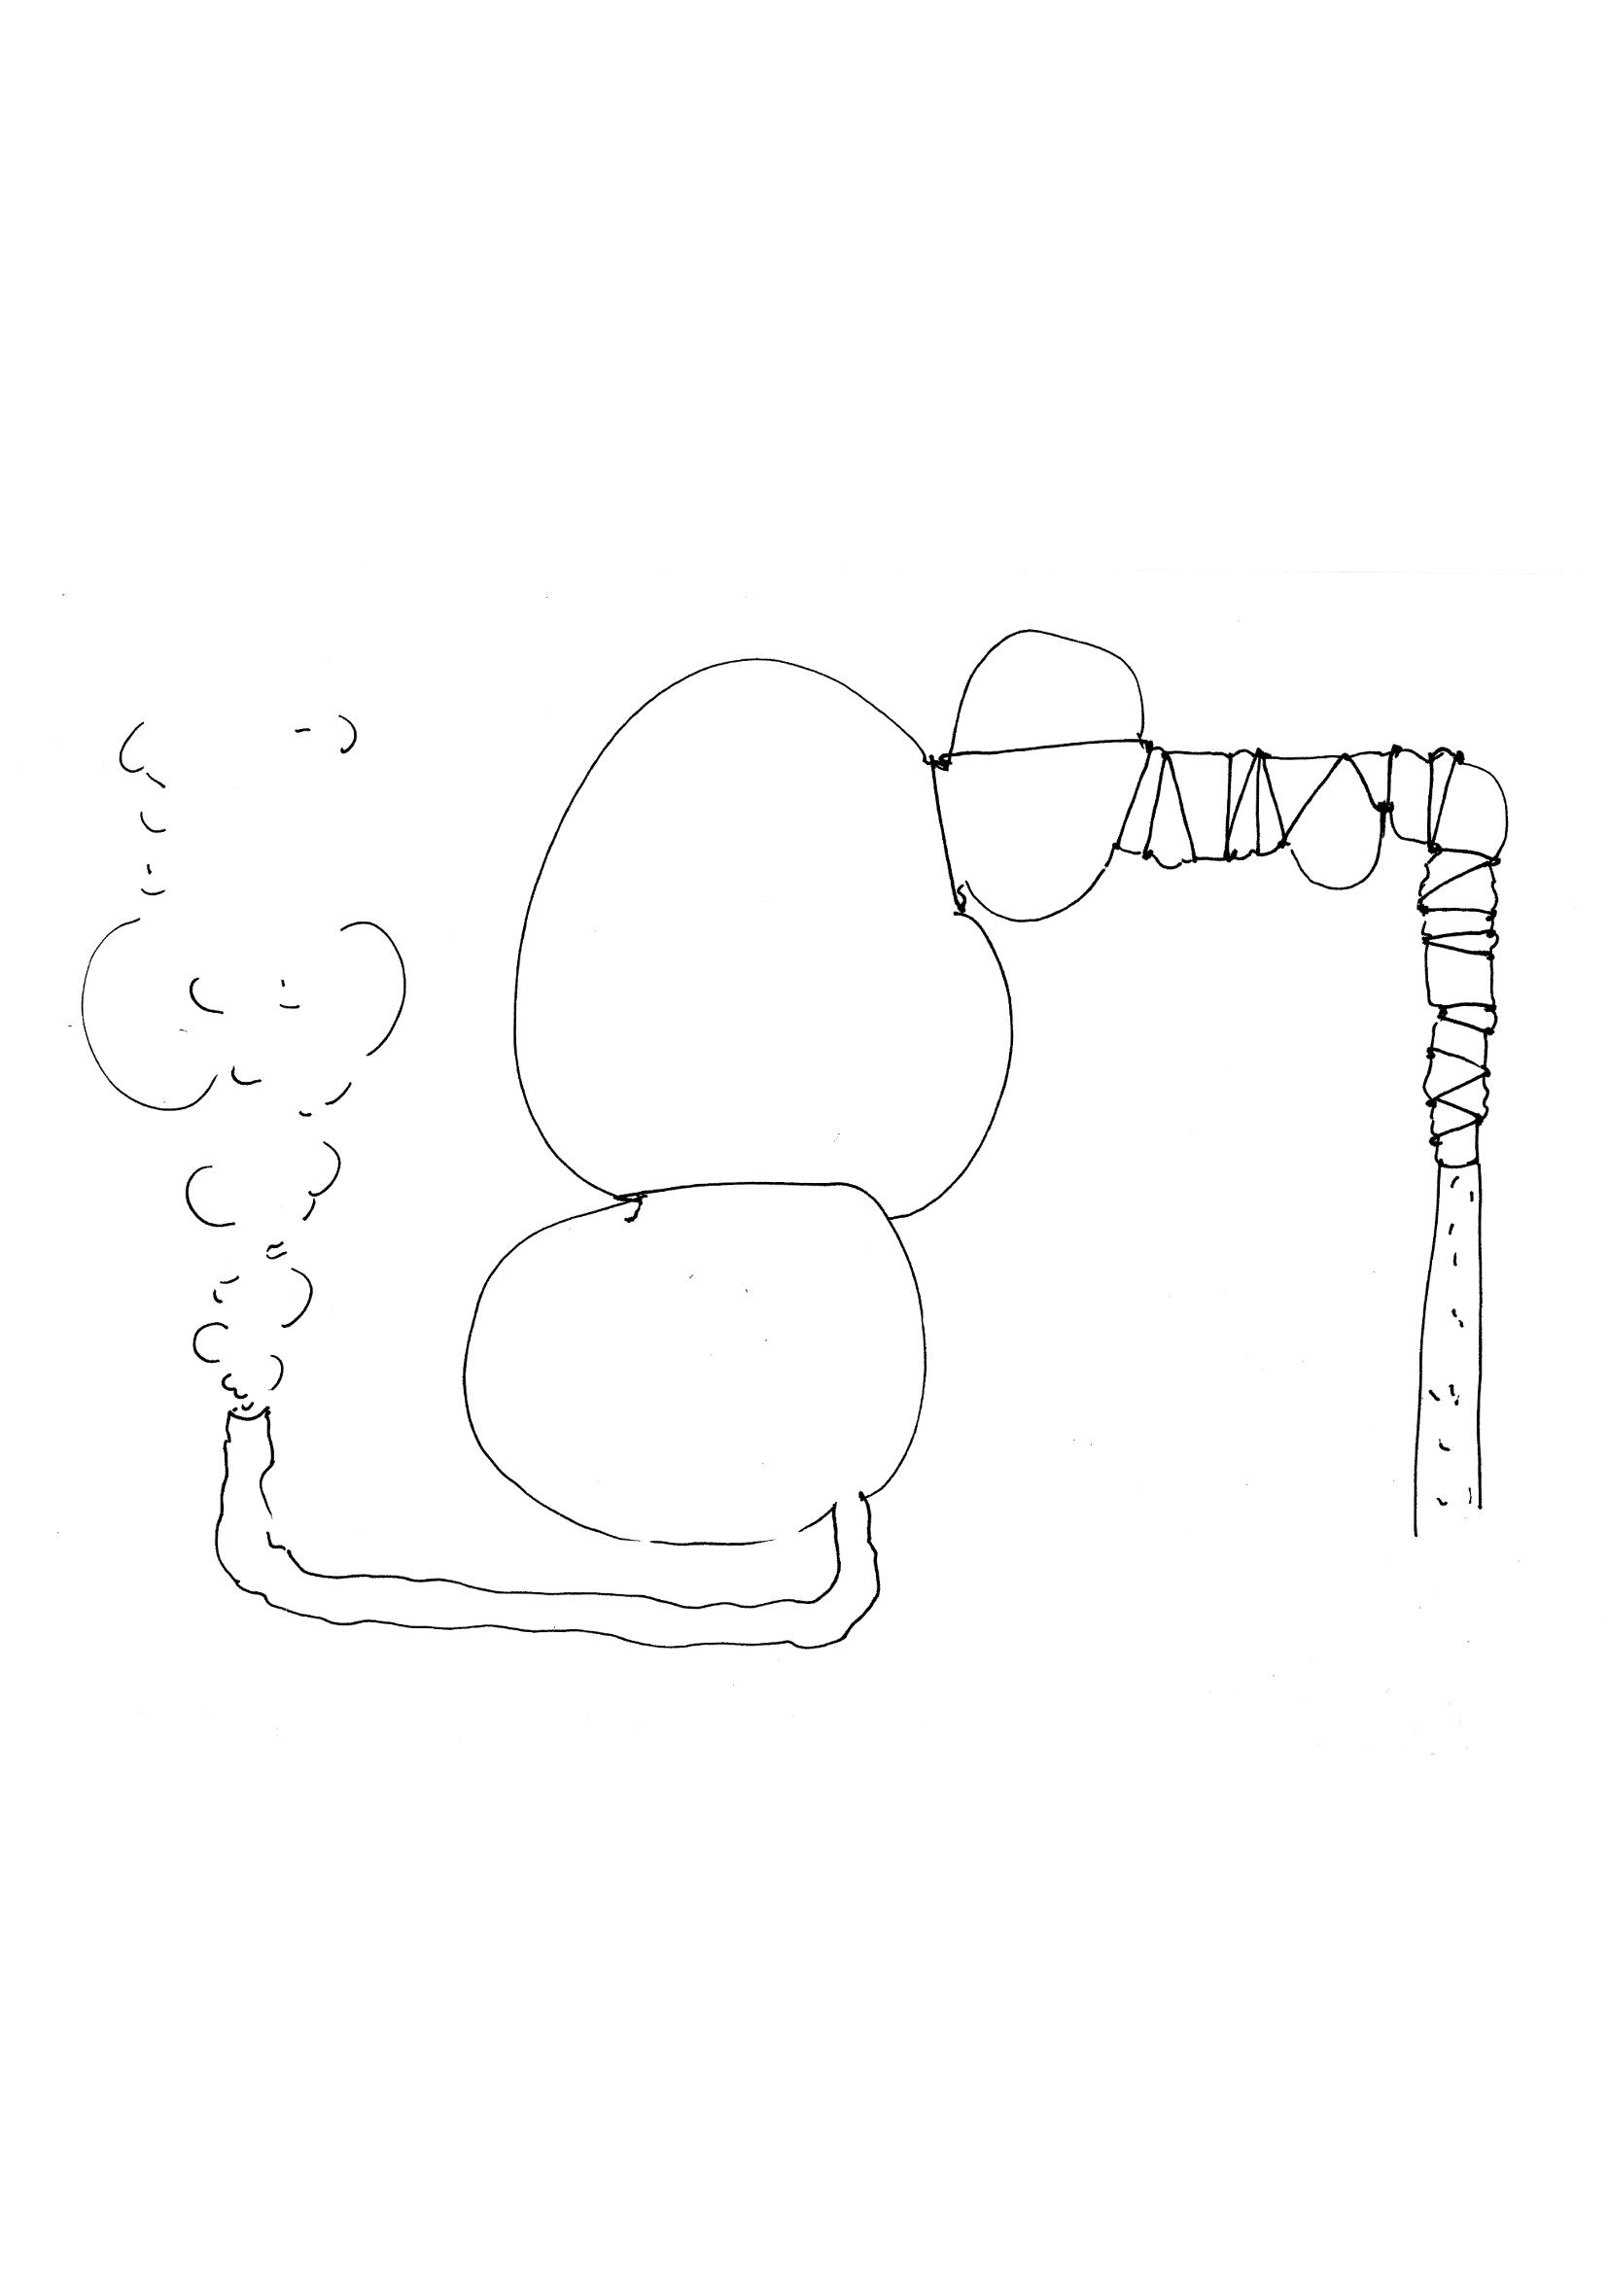 barexhaustballoon.jpg